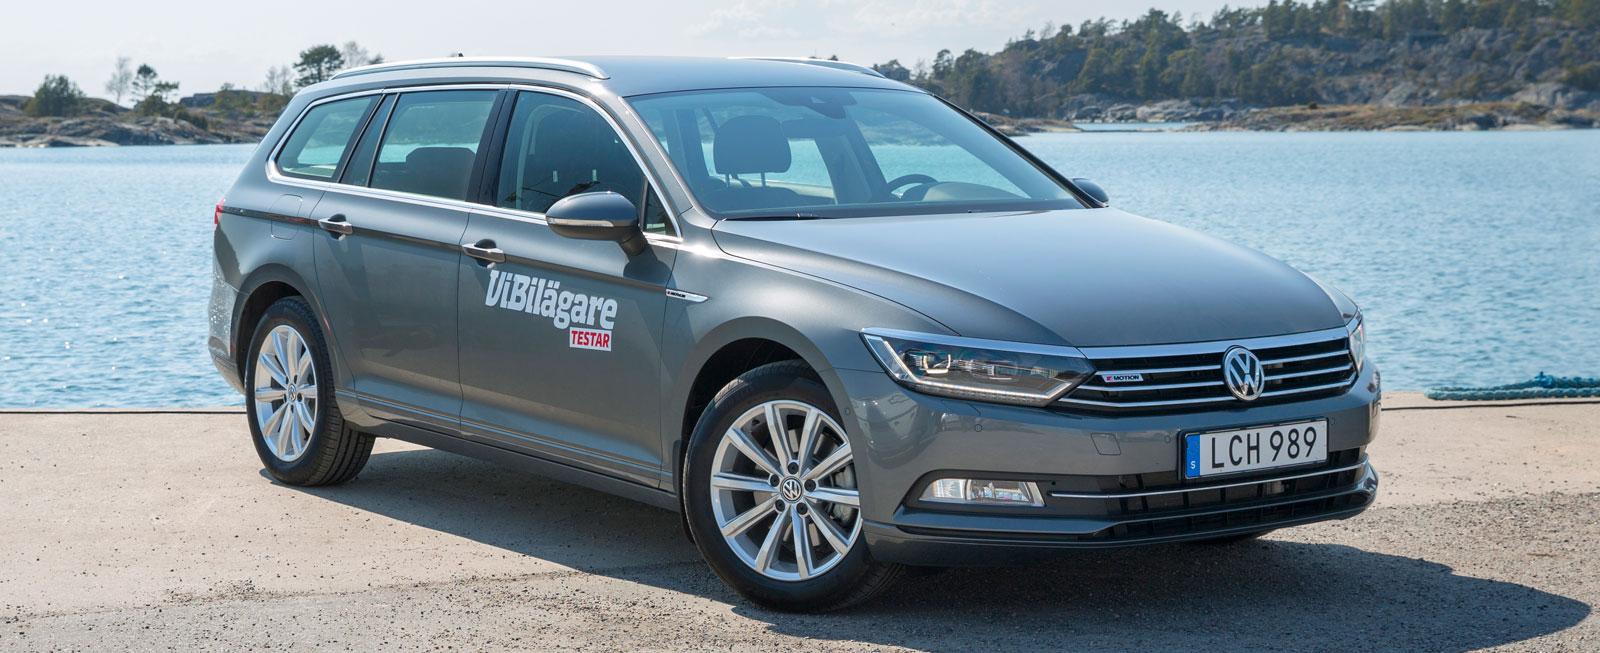 Volkswagen Passat Executive TDI 150 4-motion